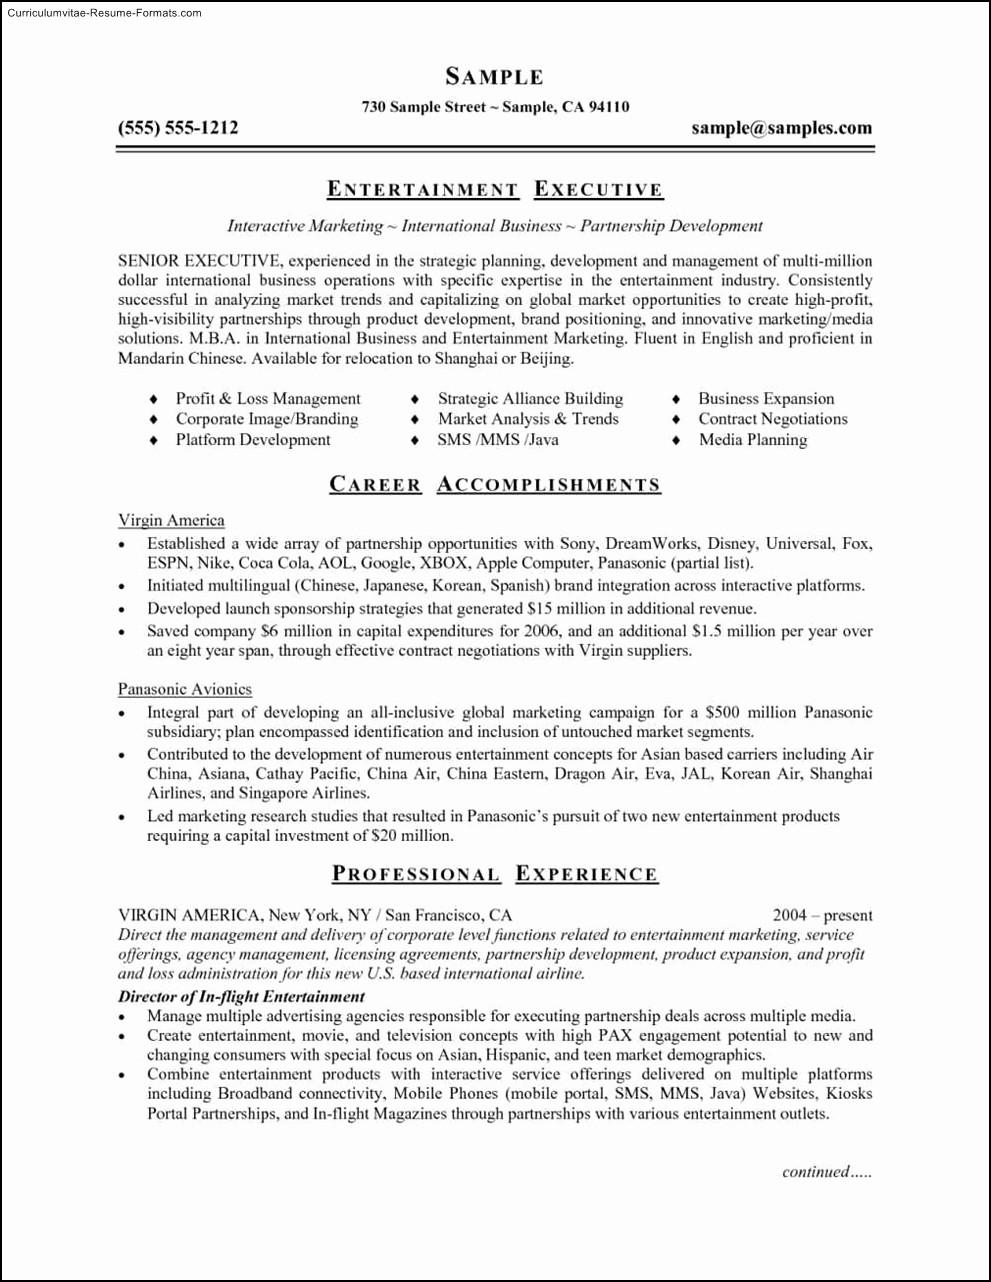 Microsoft Word 2007 Resume Templates Luxury Ms Fice 2007 Resume Templates Free Samples Examples